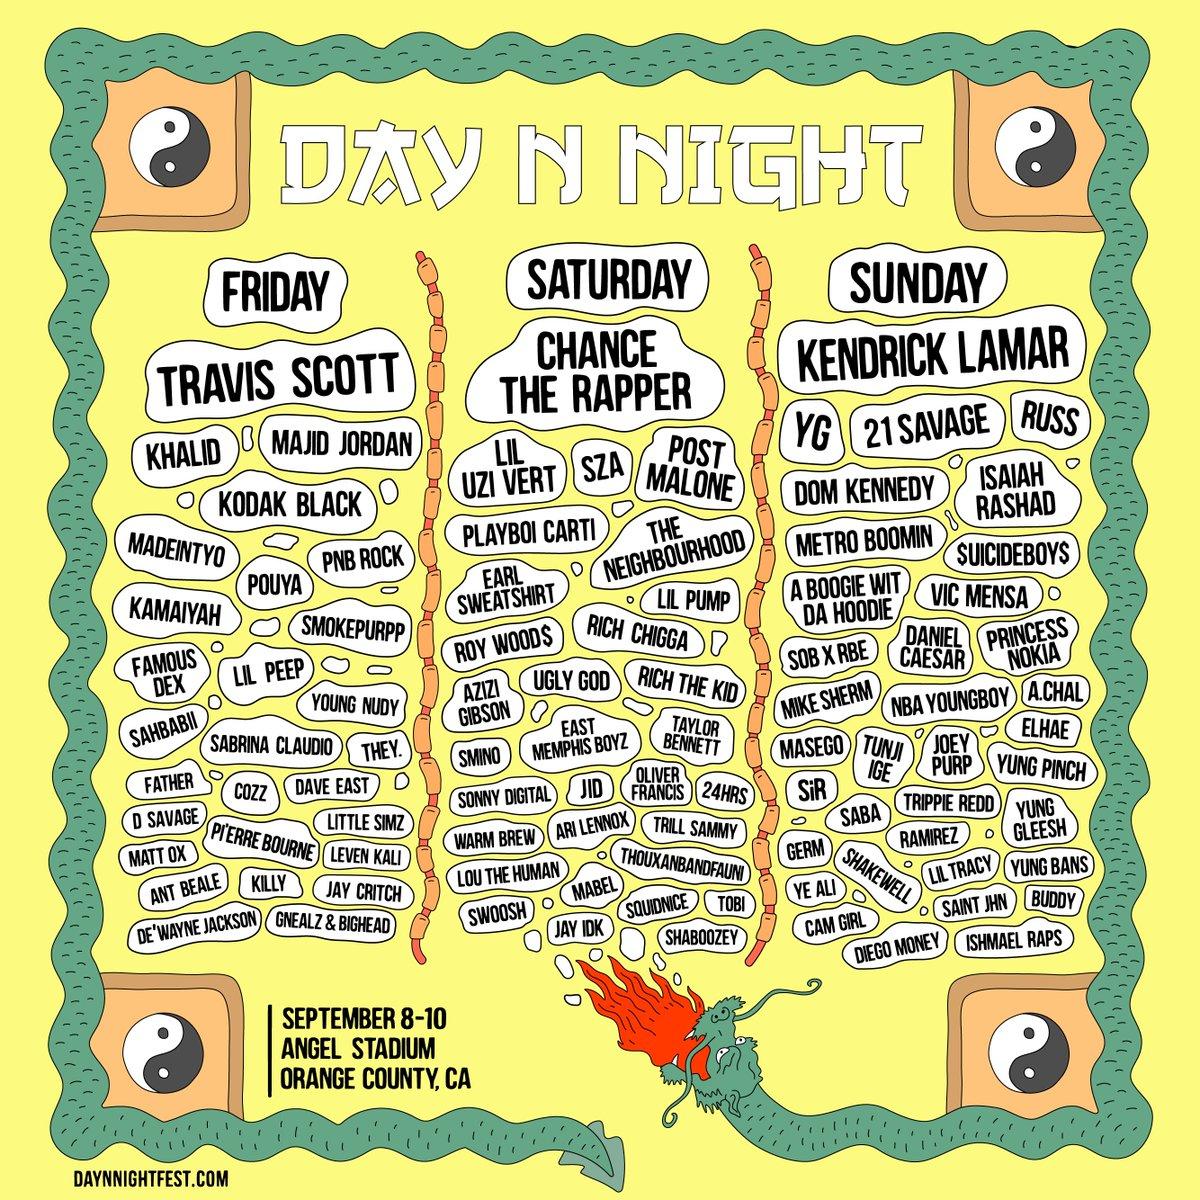 daynnight fest lineup revolt tv svperdvperfly